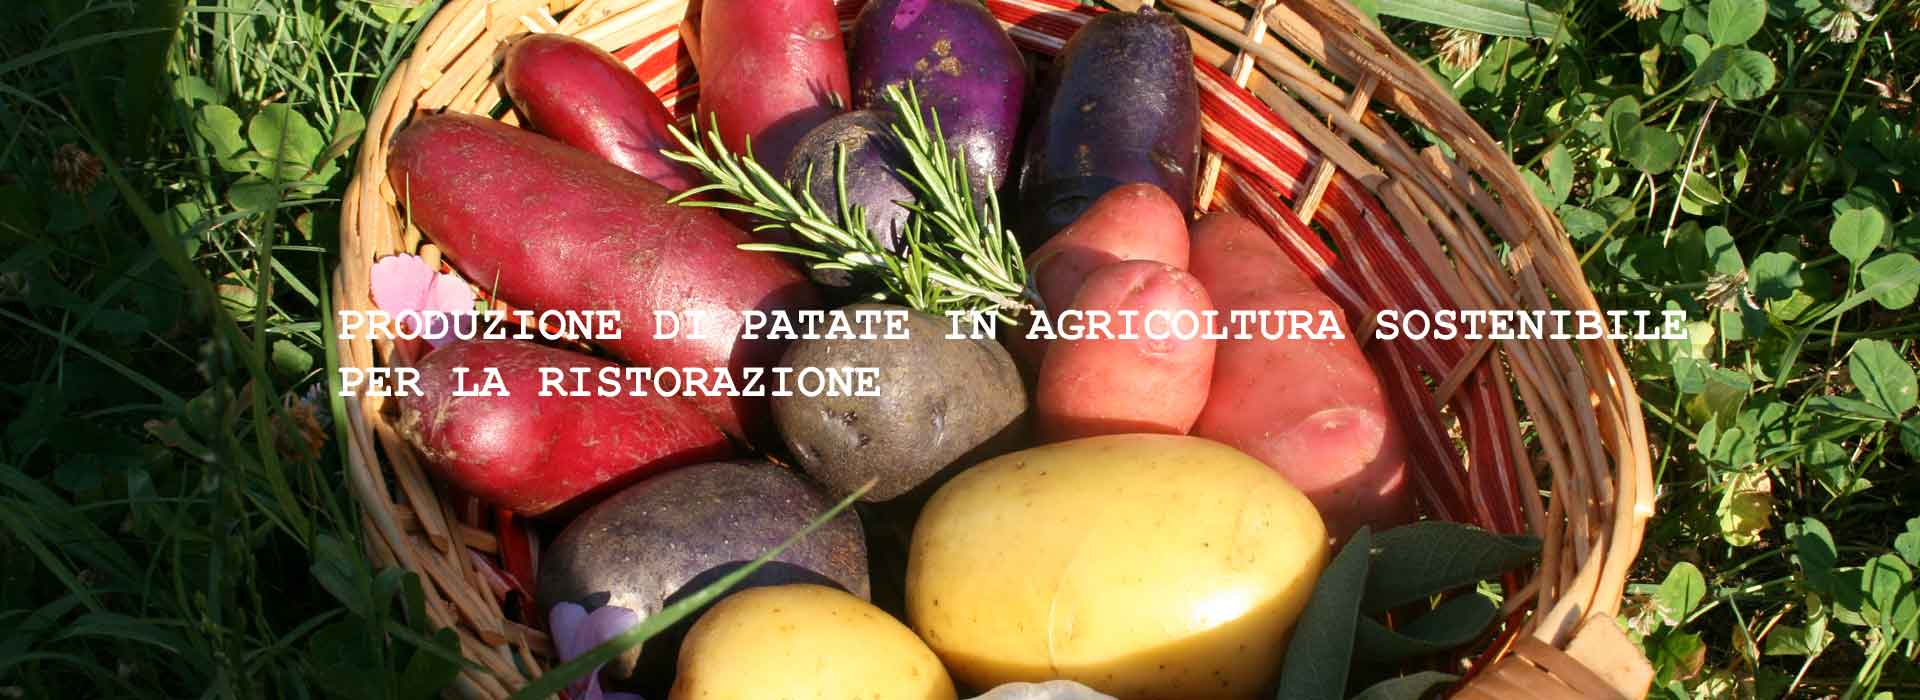 patate_hp_1